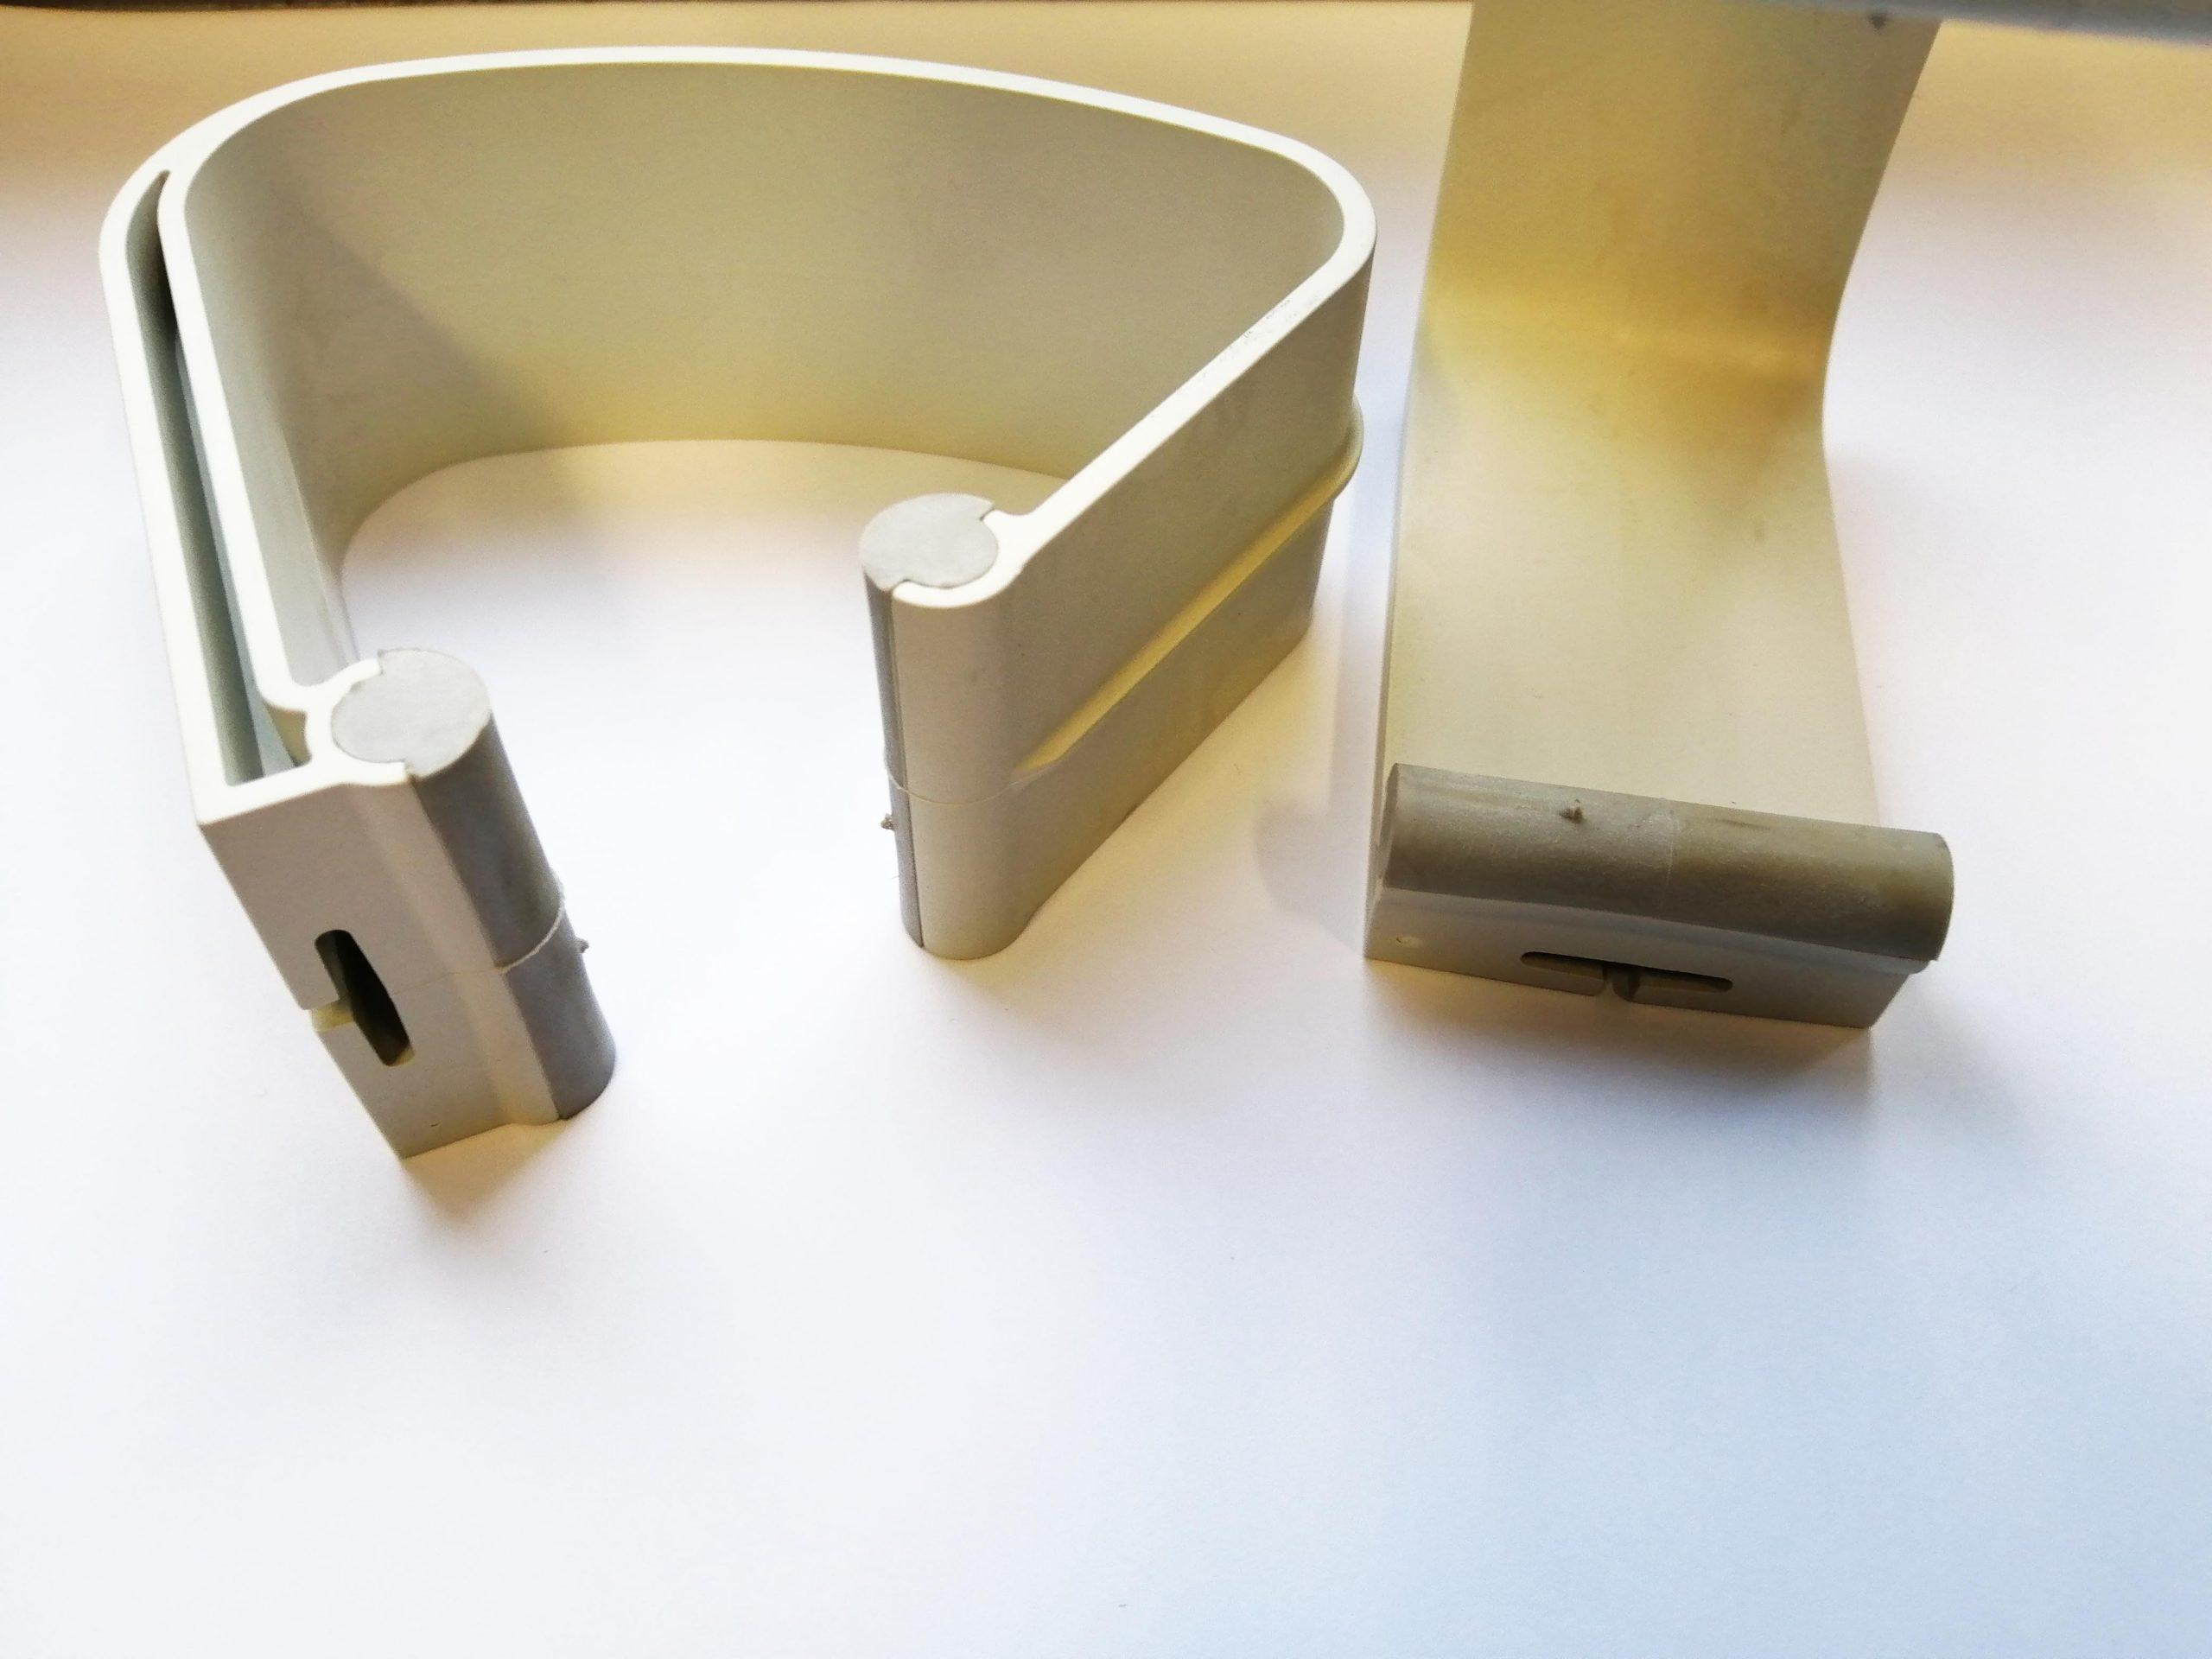 bimaterial parts